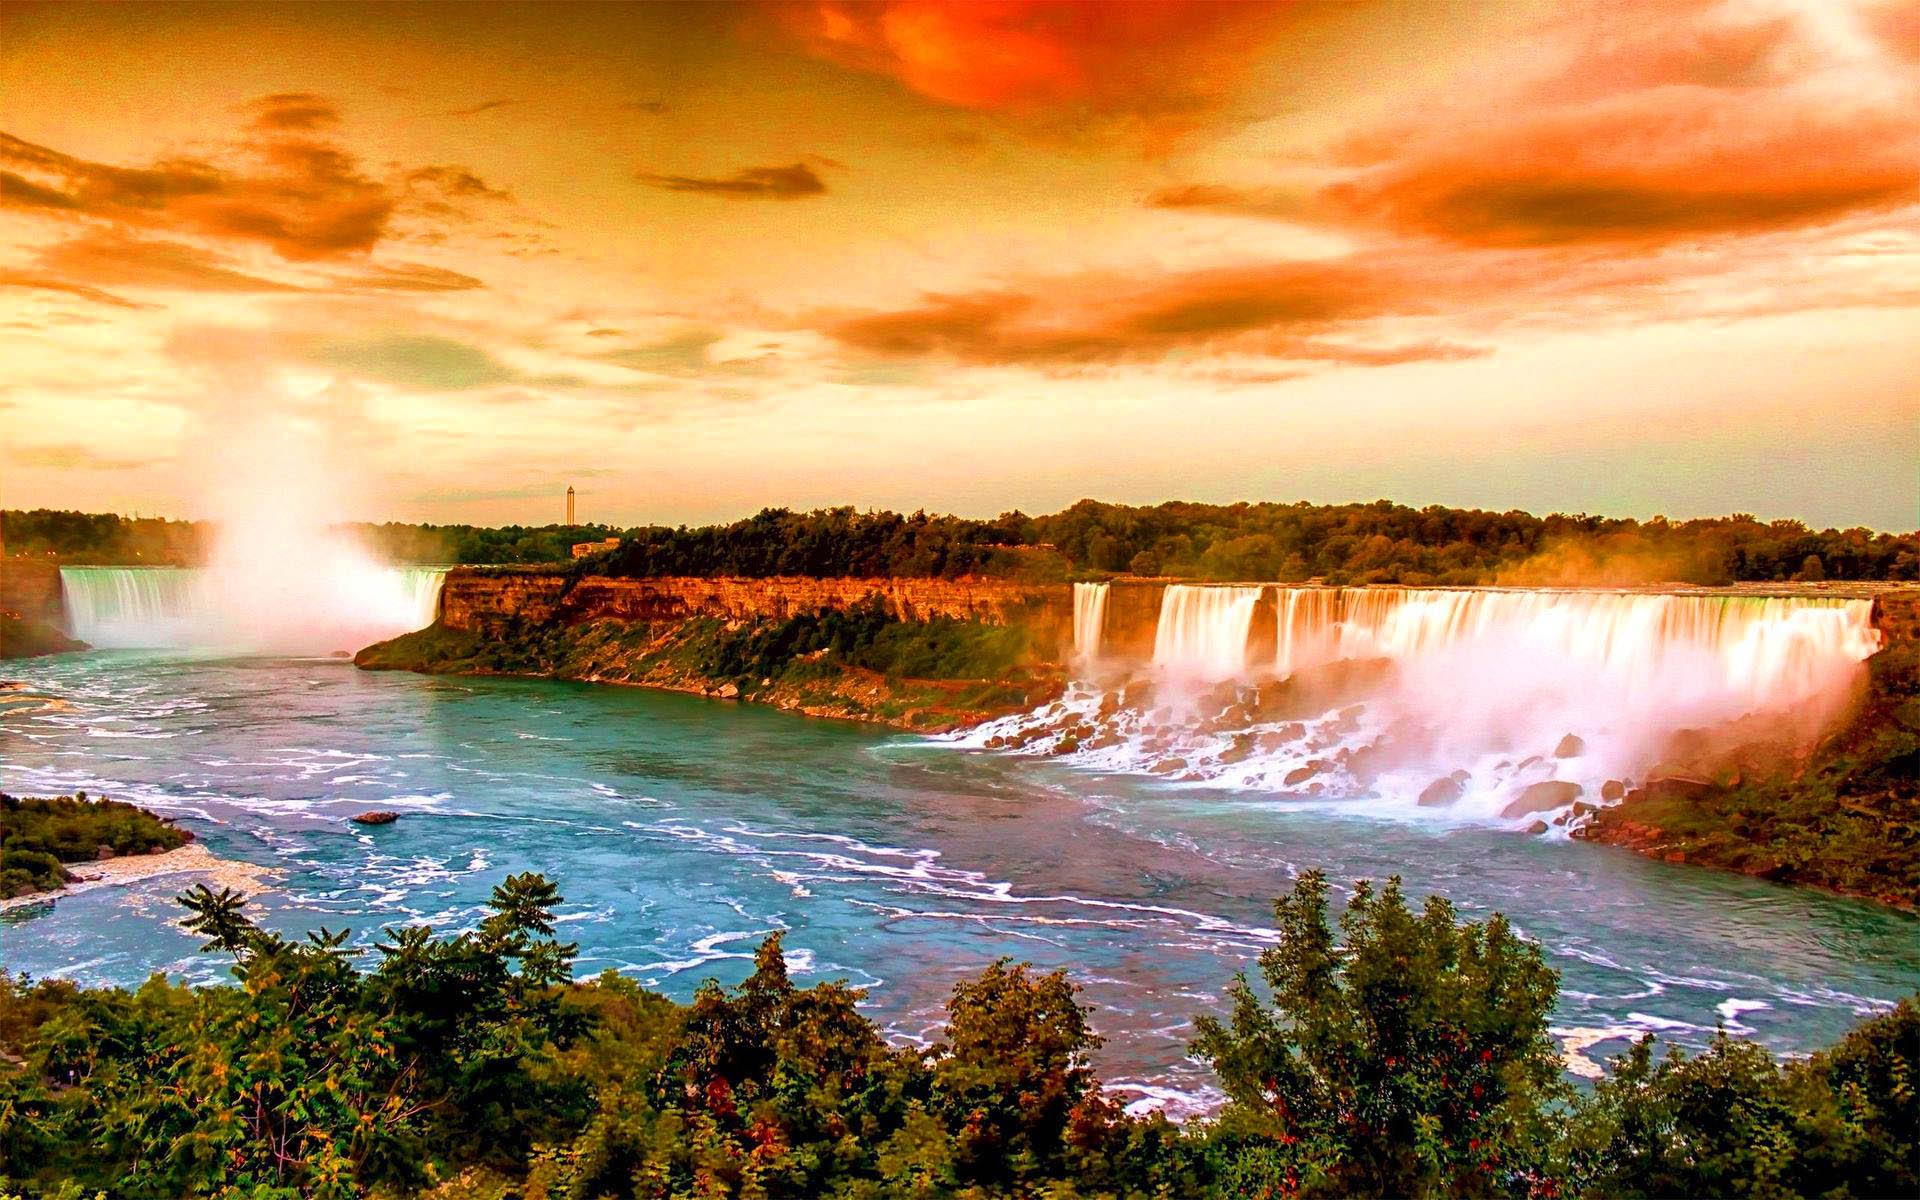 Wonderful Nature Hd Wallpaper: Hd Beautiful Nature Wallpapers Desktop Backgrounds Free